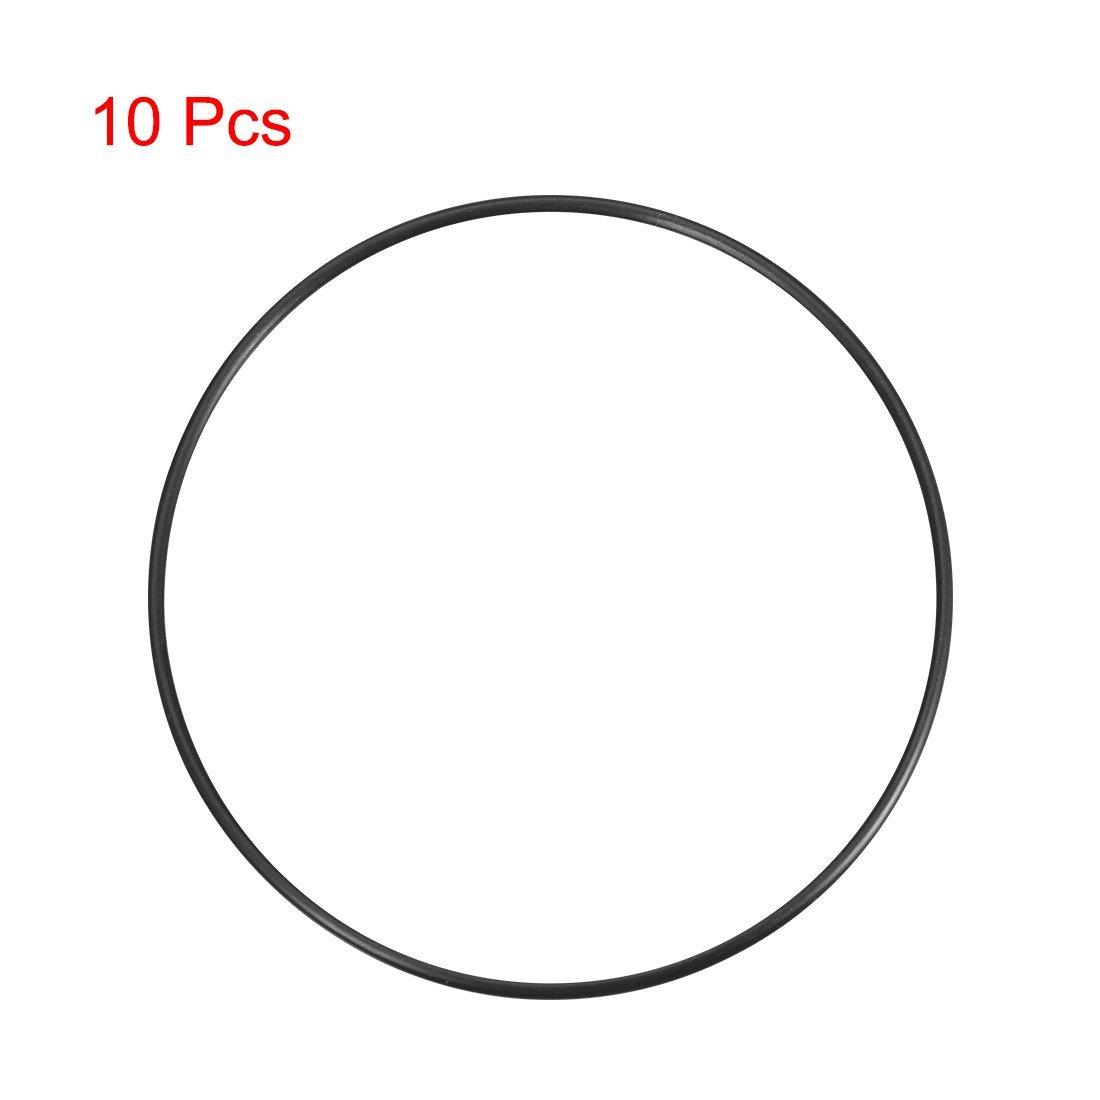 10-Round Seal Gasket Package 3.1 mm Width O-Rings Nitrile Rubber 125 mm Outer Diameter 118.8 mm Inner Diameter